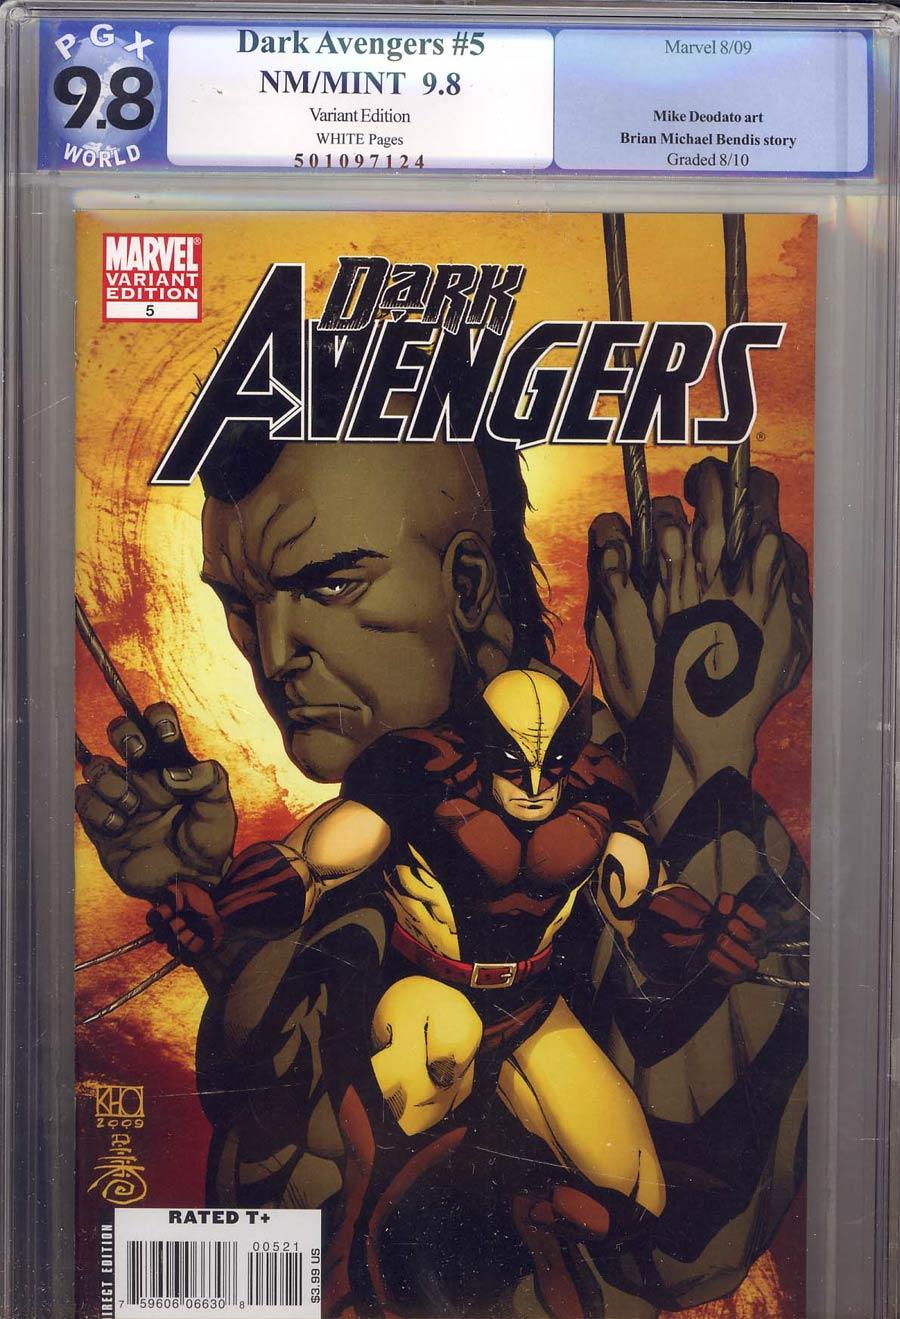 Dark Avengers #5 Cover C Incentive Khoi Pham Variant Cover (Dark Reign Tie-In) PGX 9.8